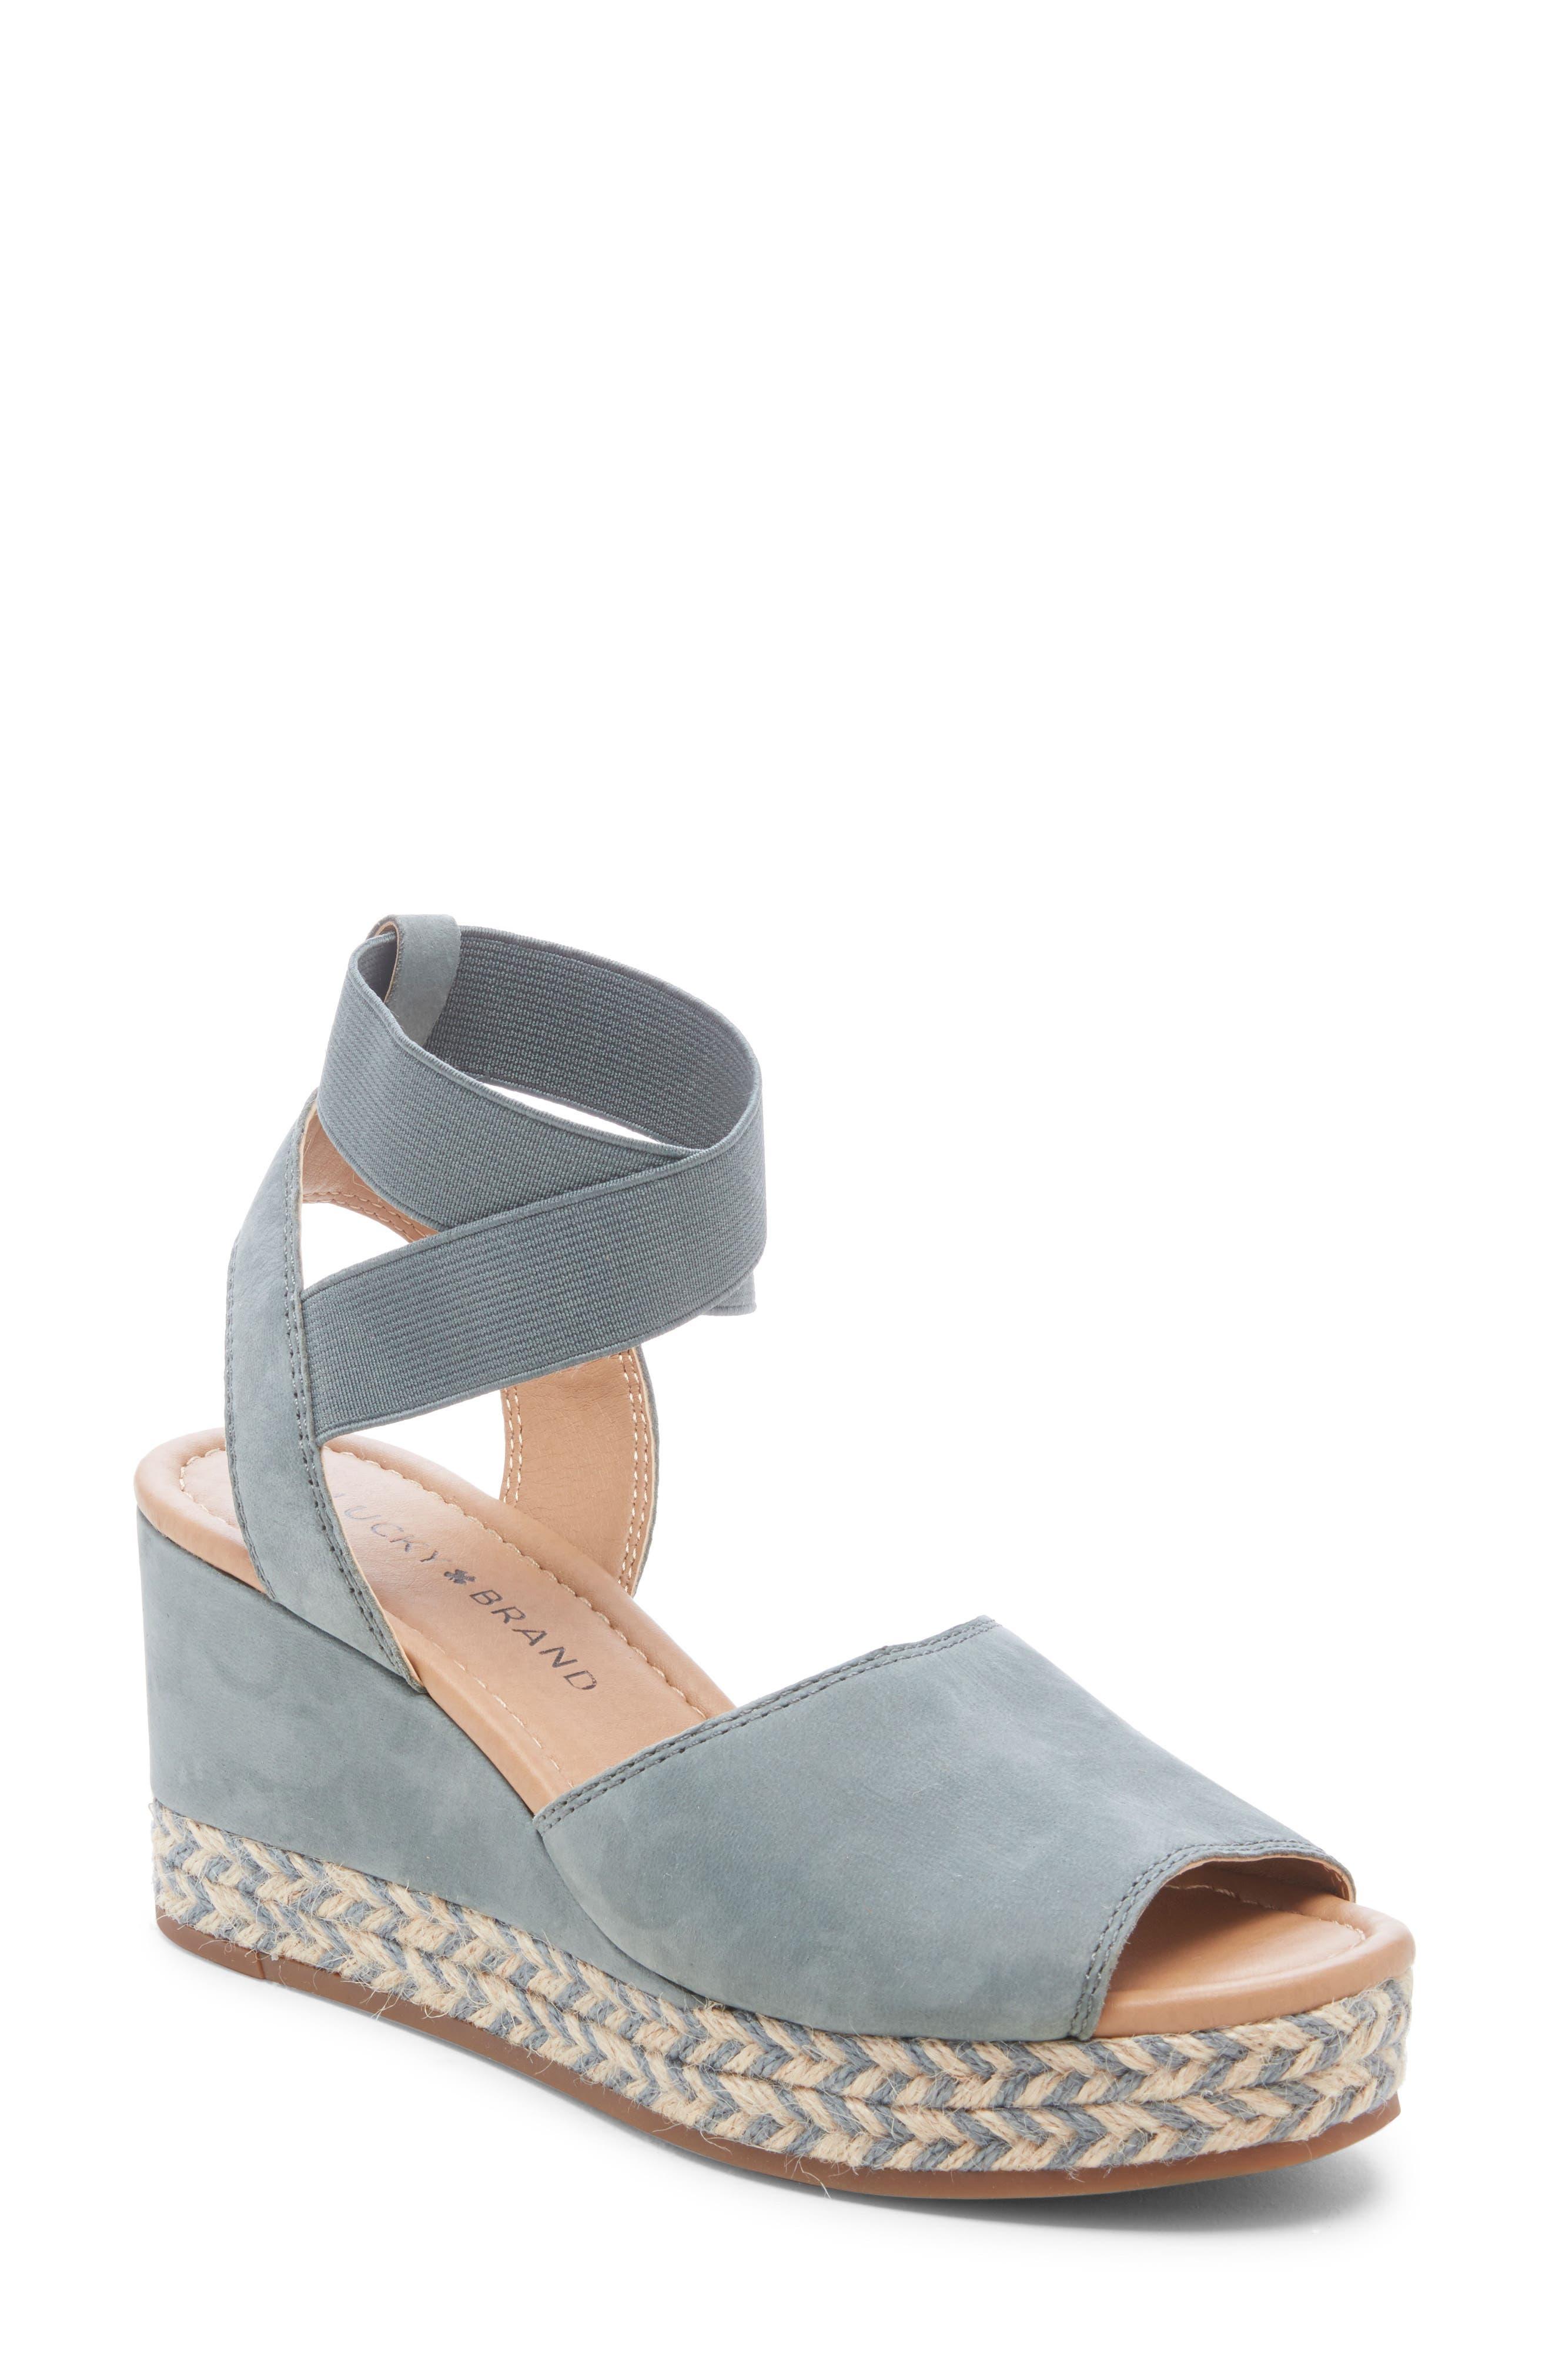 Lucky Brand Bettanie Espadrille Wedge Sandal, Blue